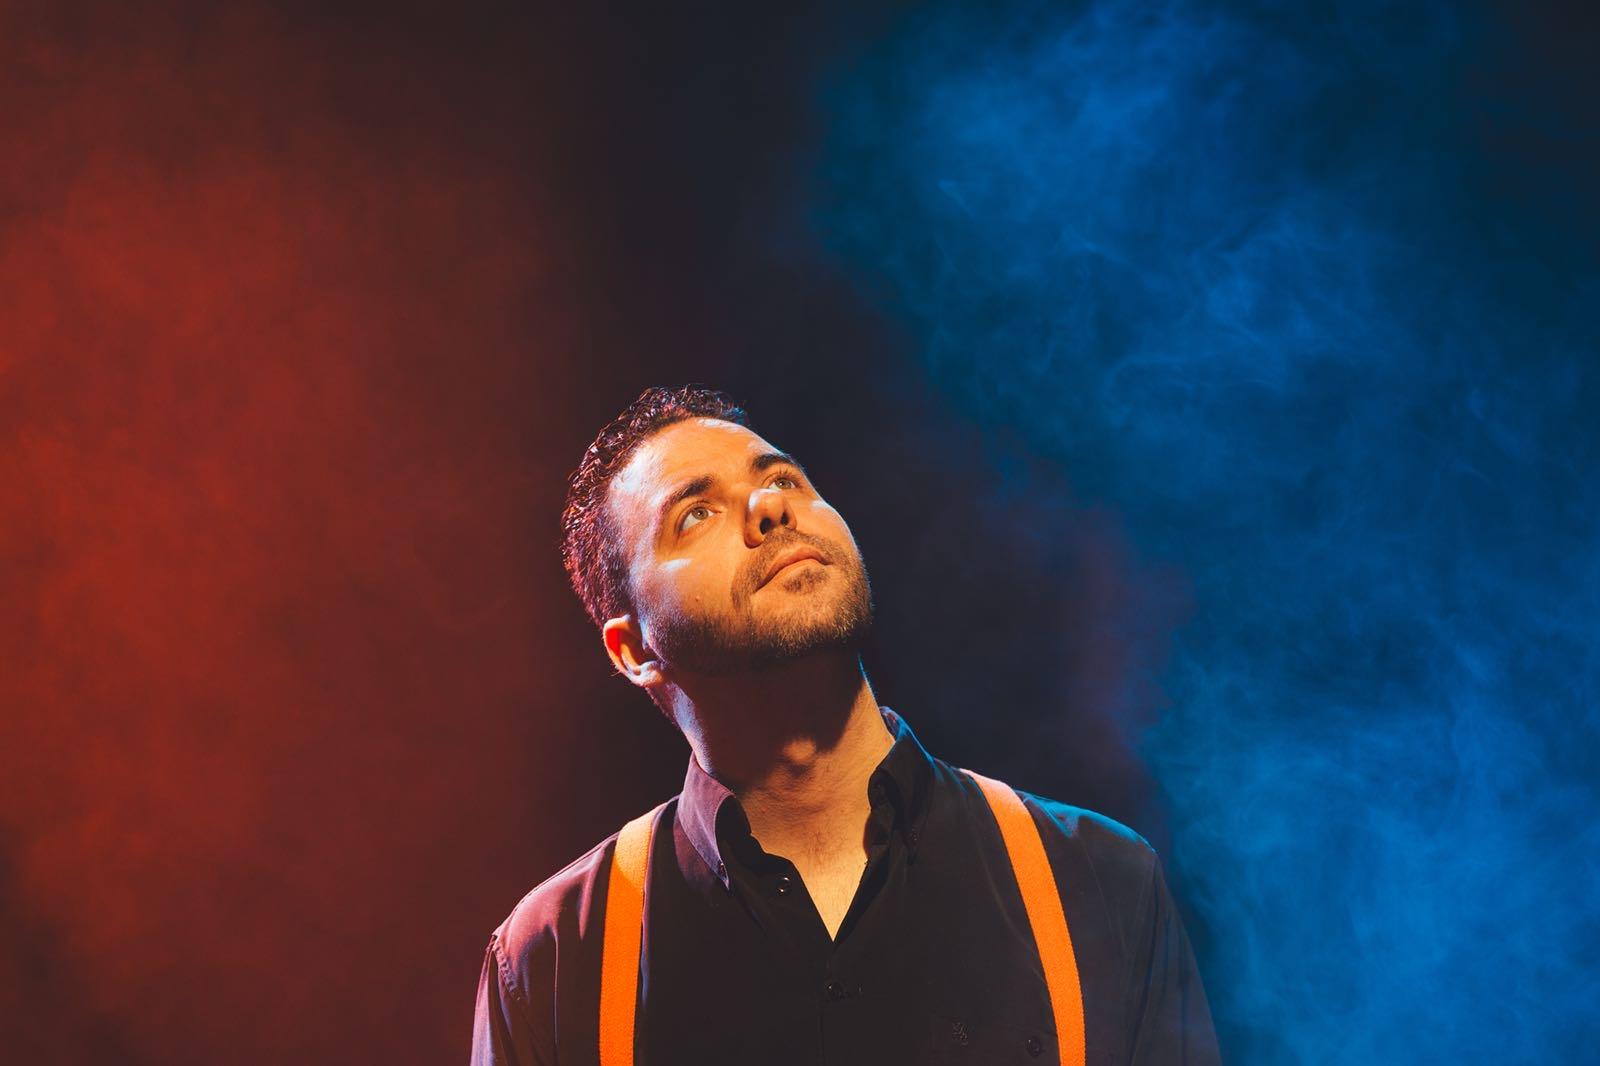 José Antonio López (Señor Naranja)